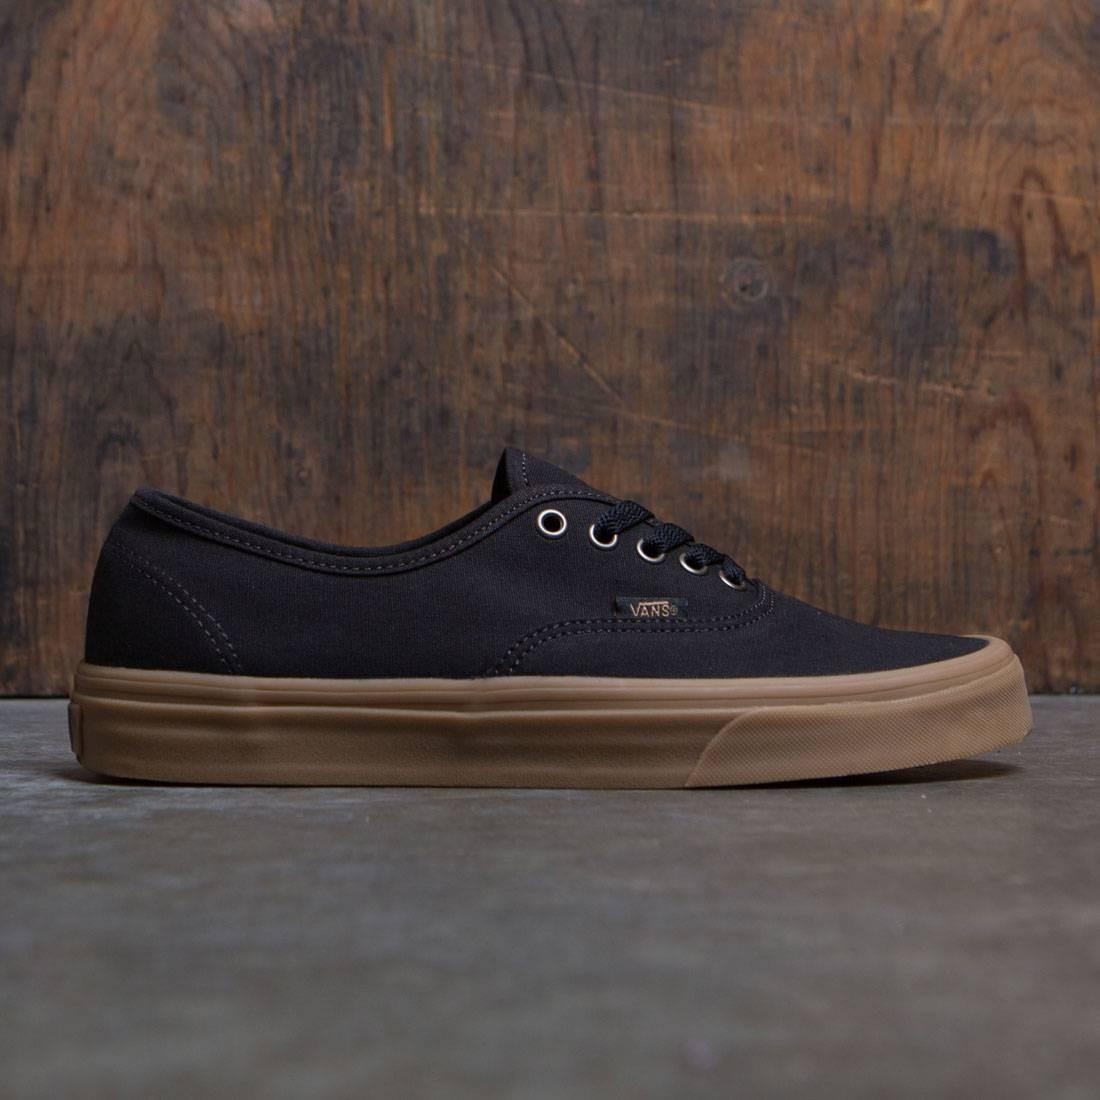 Vans Men Authentic - Light Gum black